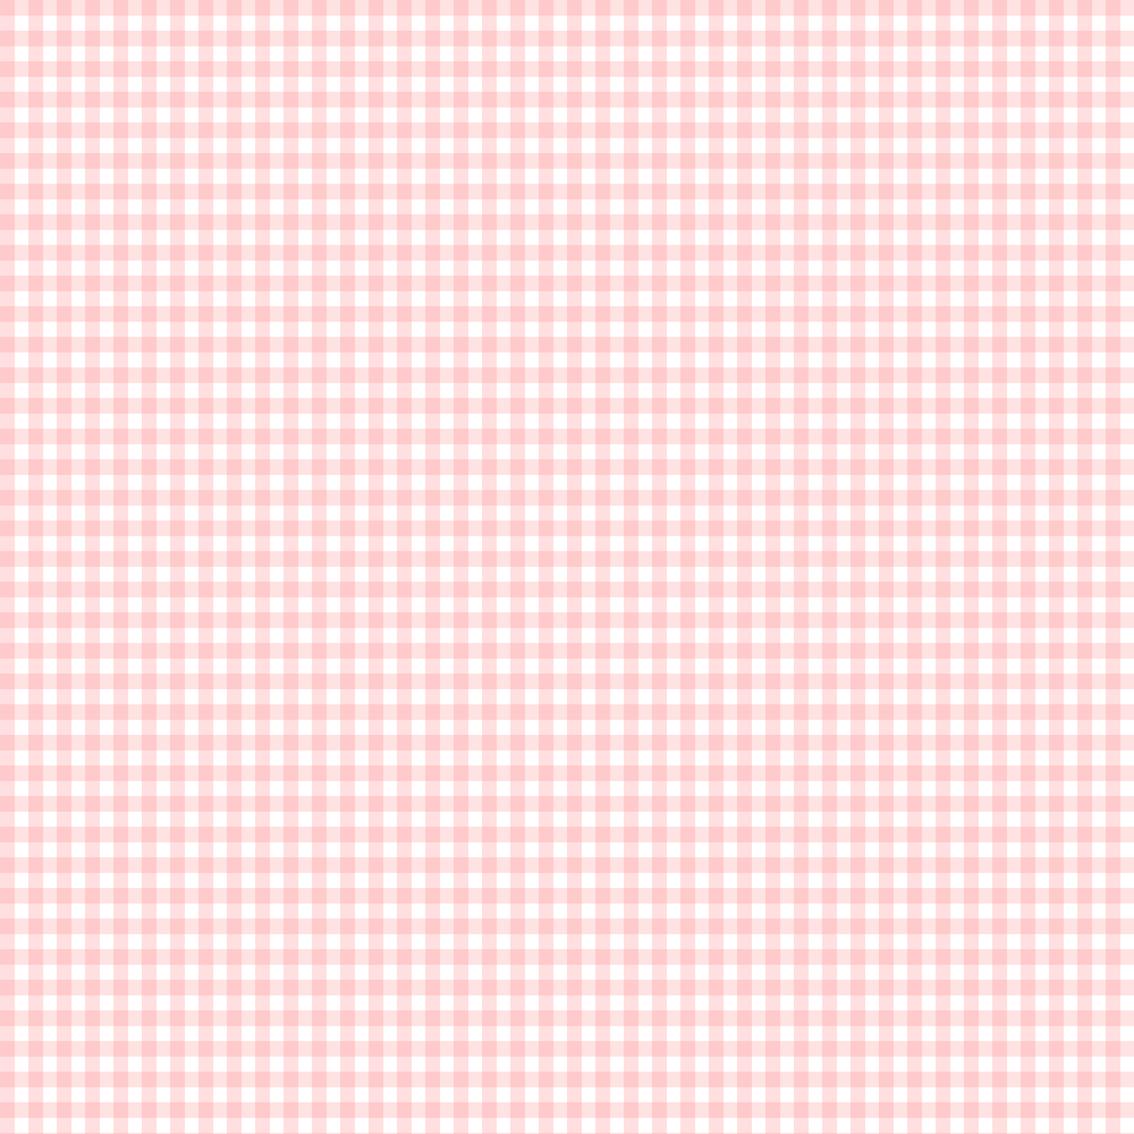 Scrapbook paper baby -  La Vie En Rose Free Printable Digital Scrapbooking Paper Polka Dot Butterfly Plaid And Little Stars Ausdruckbares Scrapbooking Papier Freebies